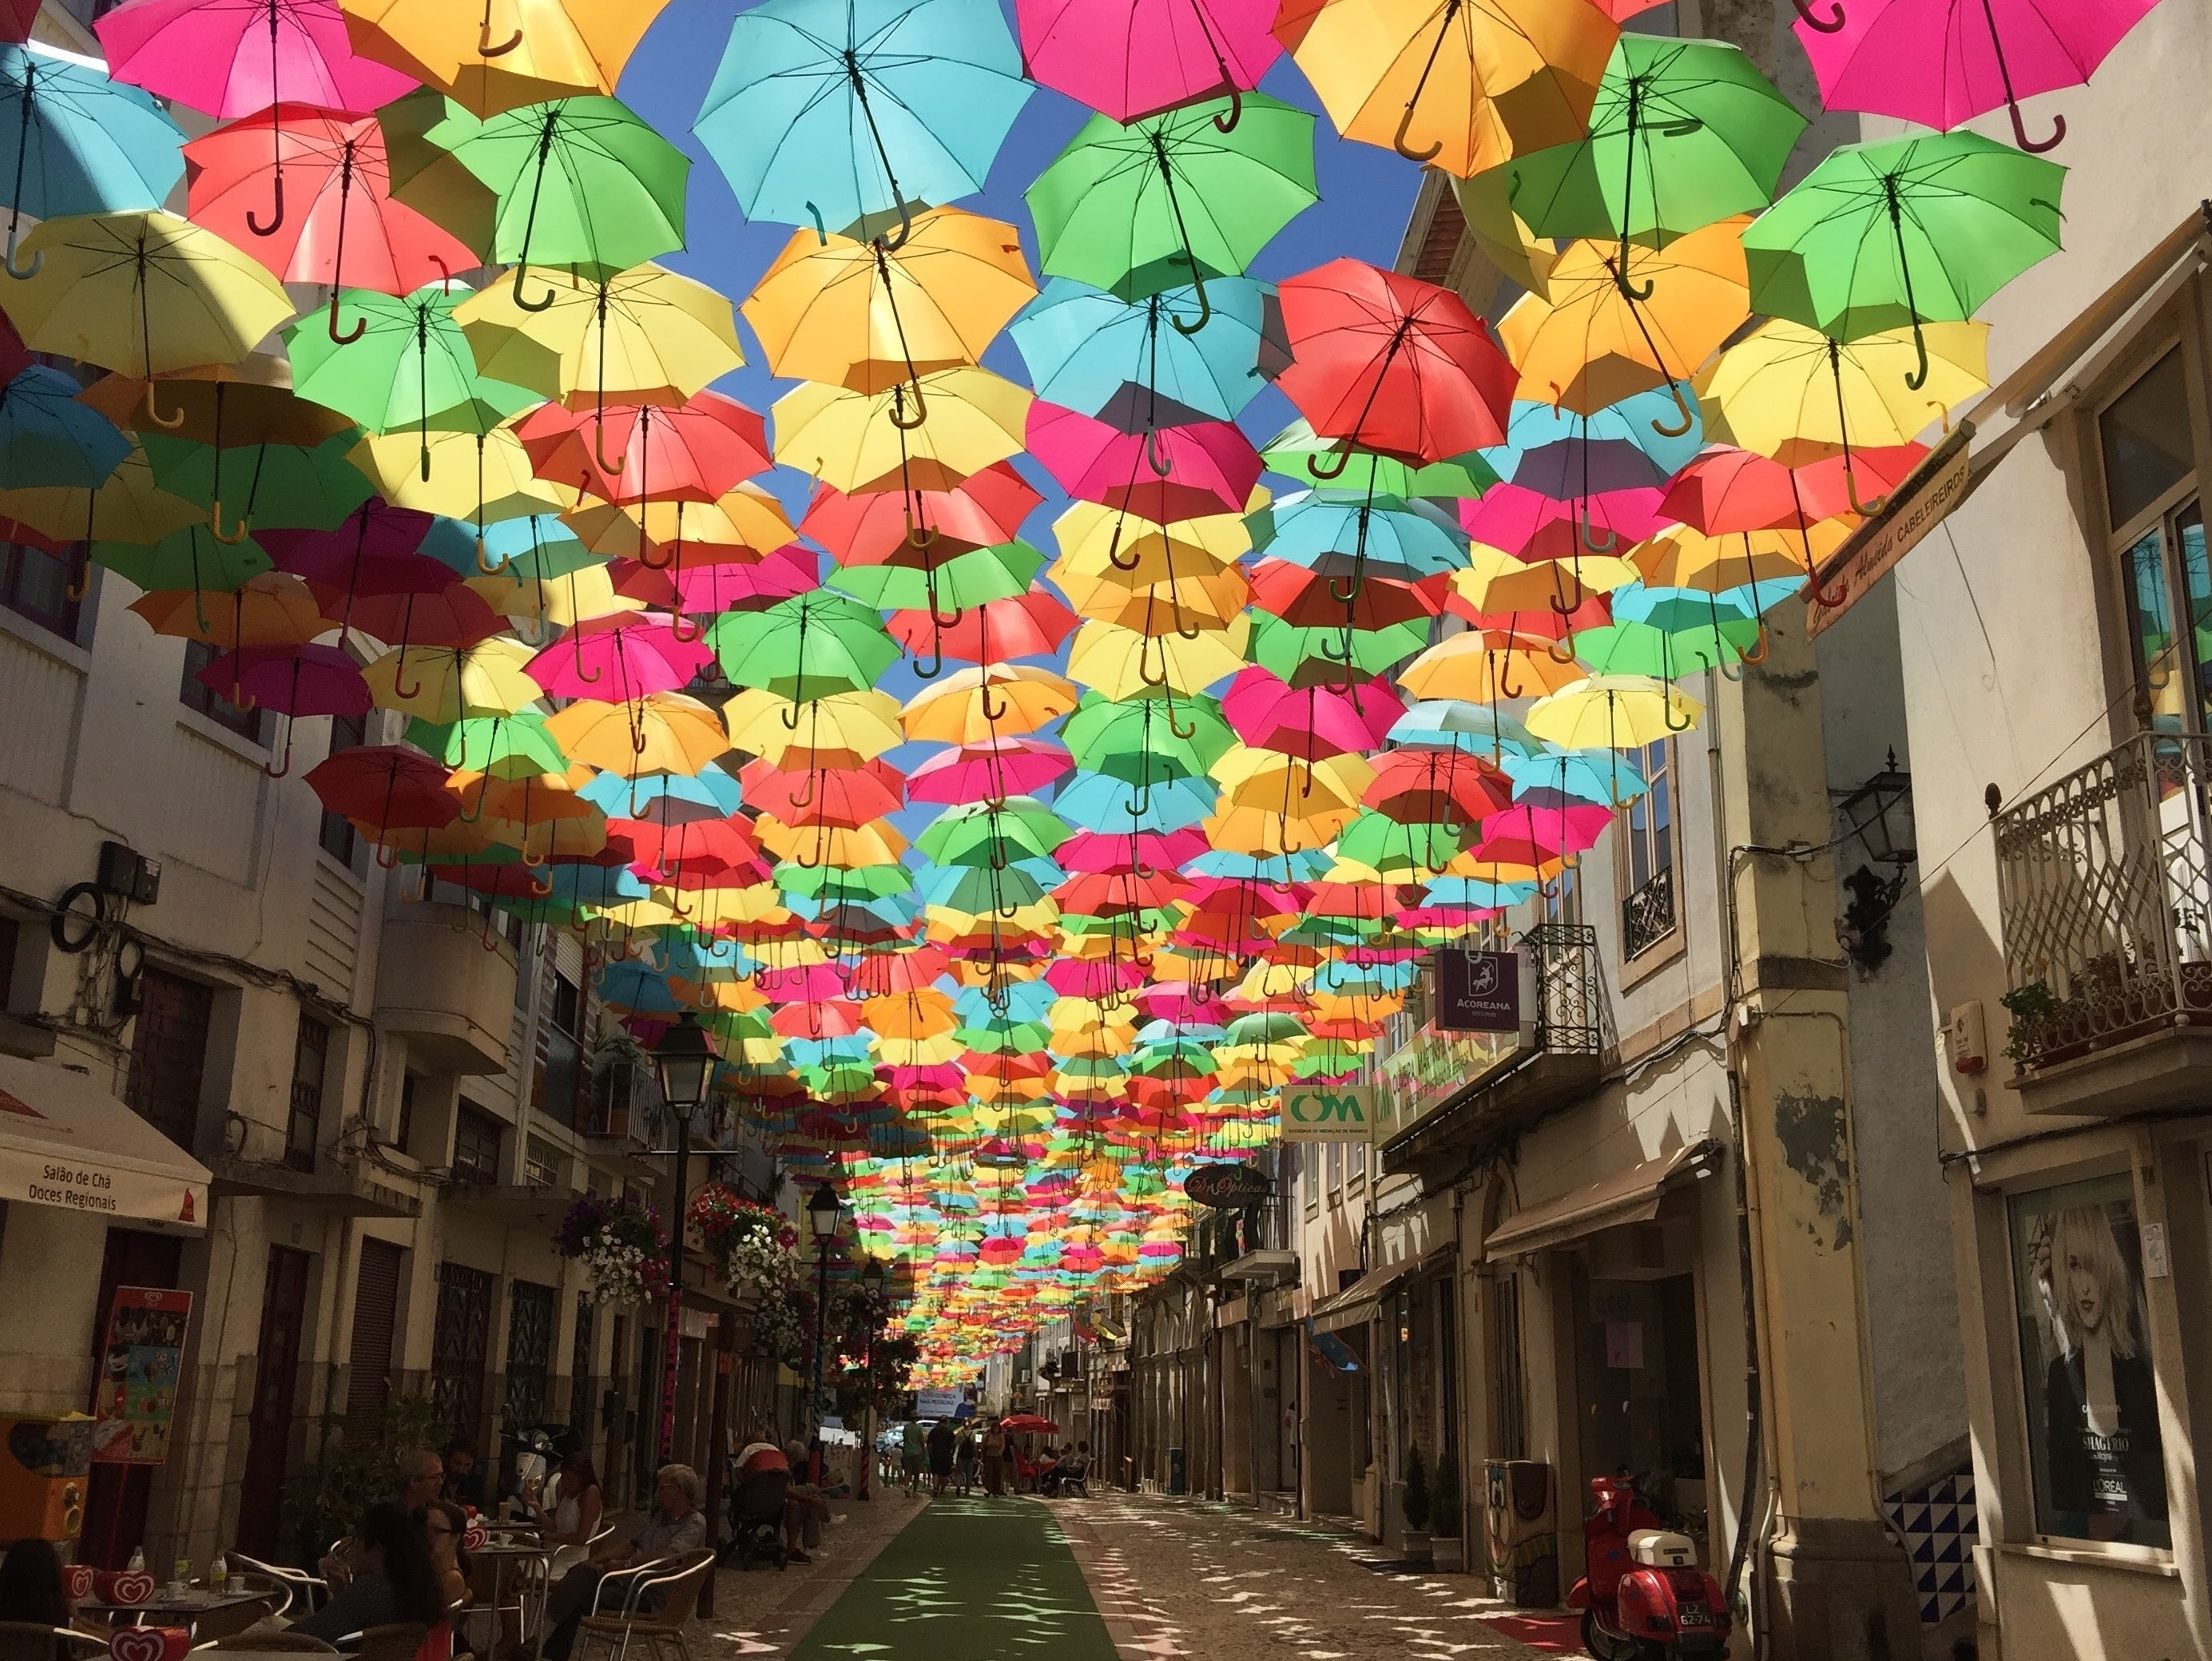 Agueda, Aveiro District, Portugal